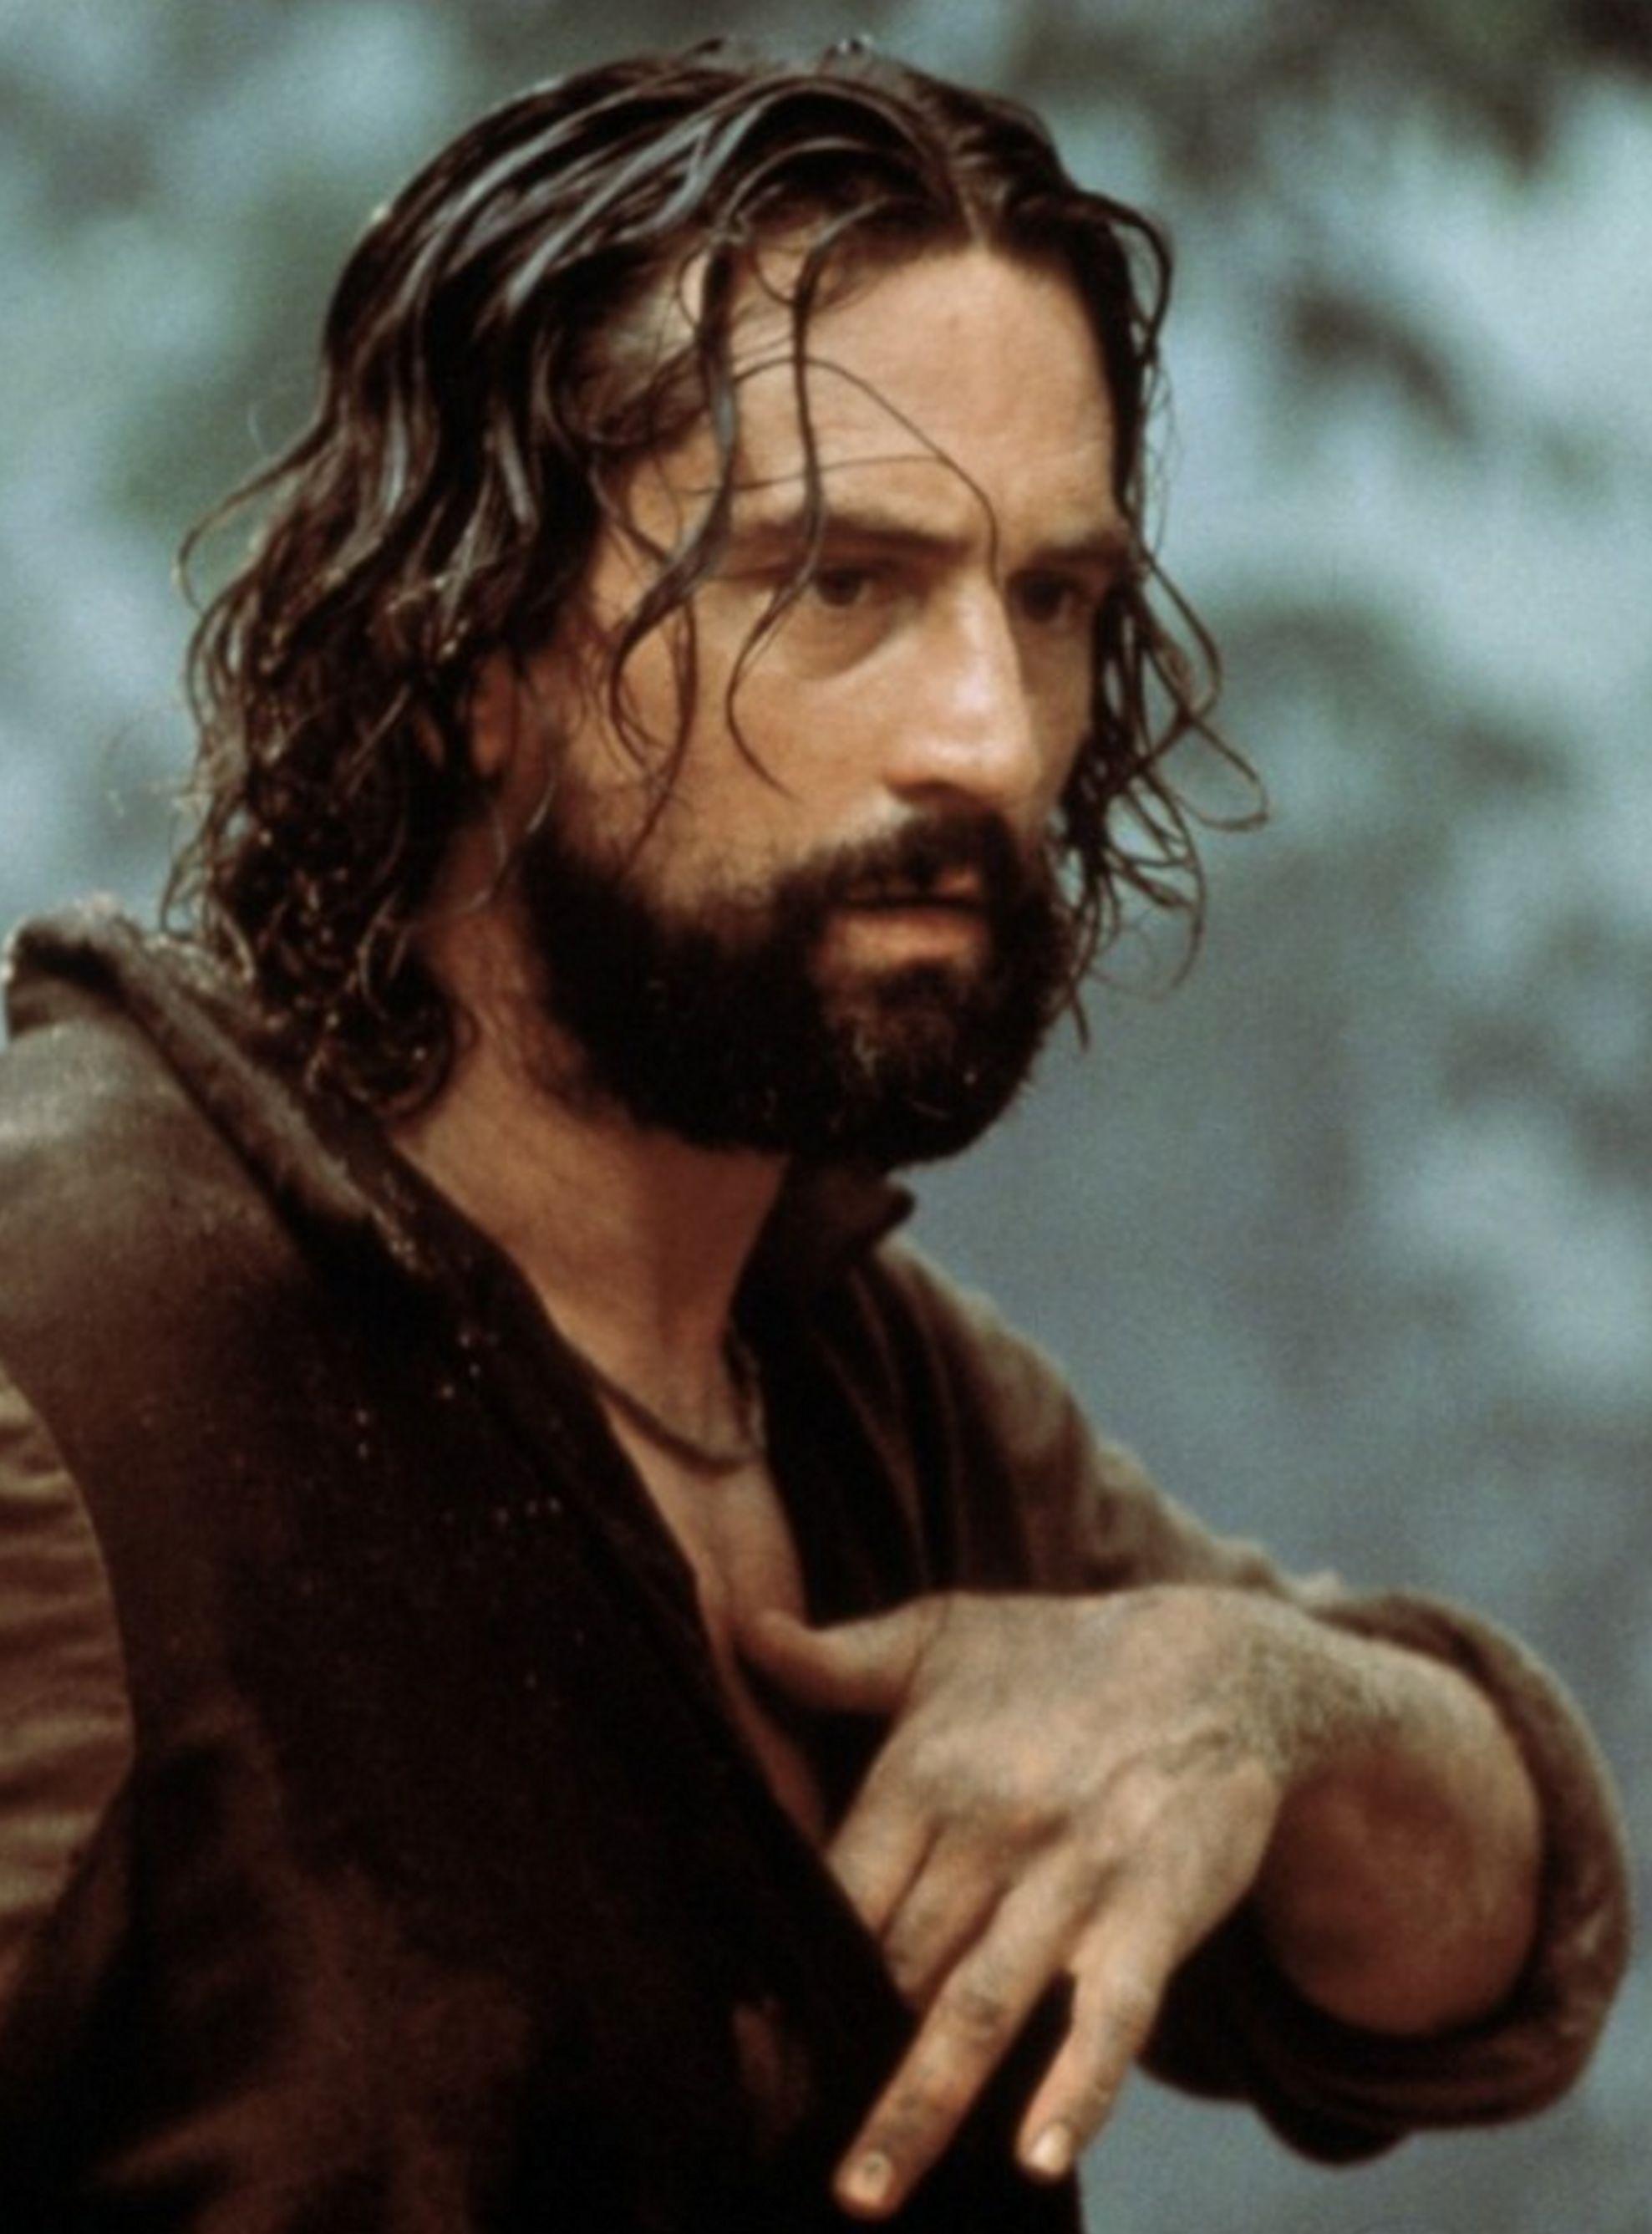 Robert De Niro (43). 1986. The Mission, British drama film